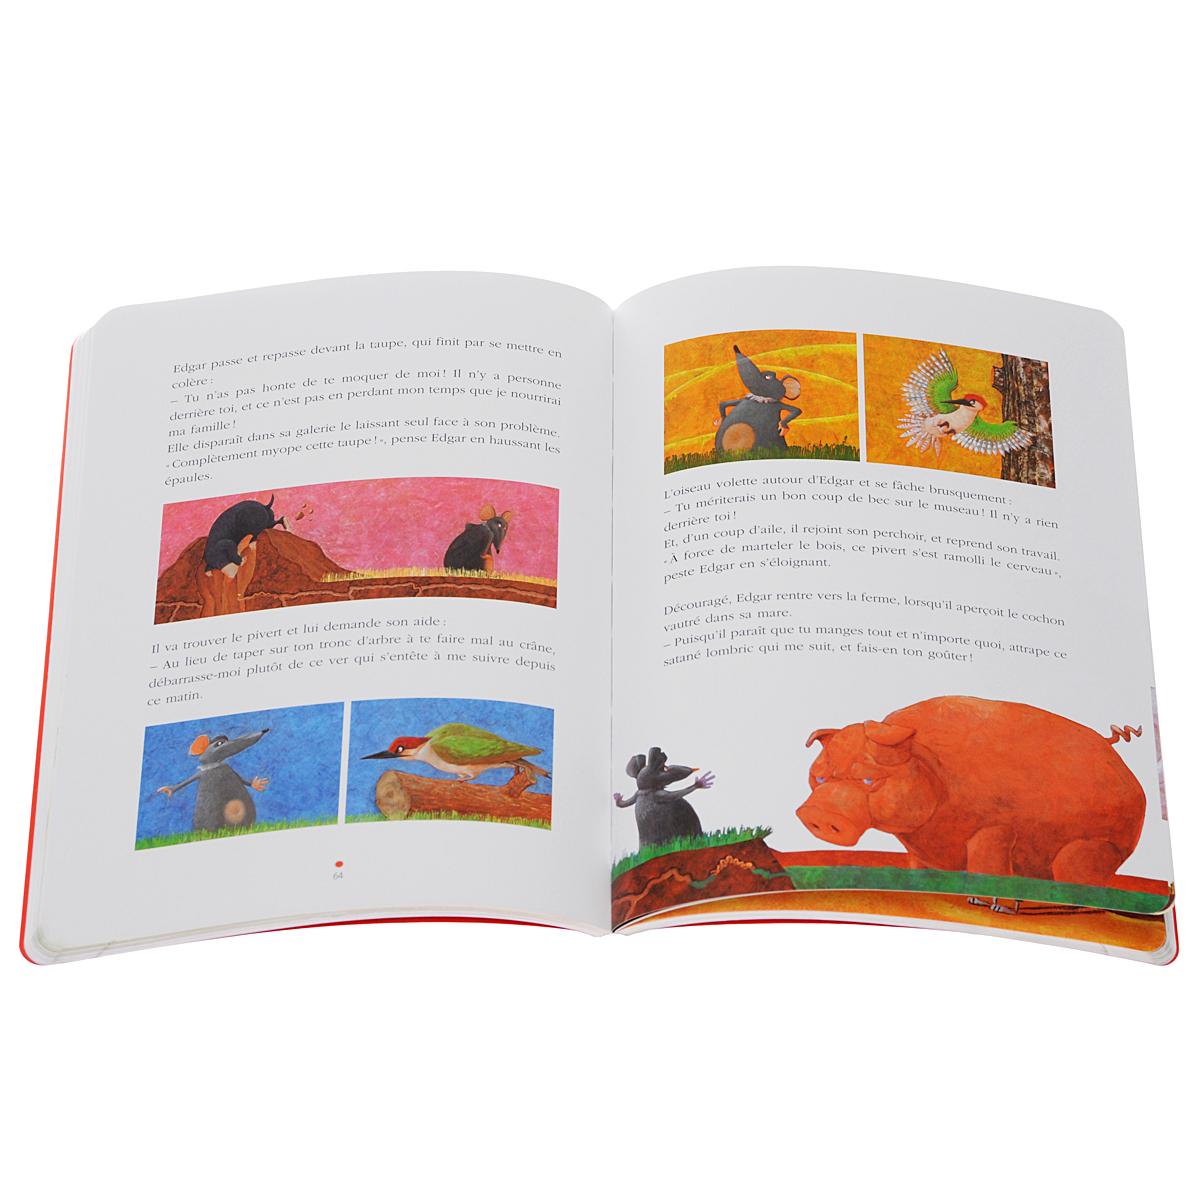 Le Nouvel Edito: CD-Rom Autocorrectif B1 (Cahier D'Exercices)